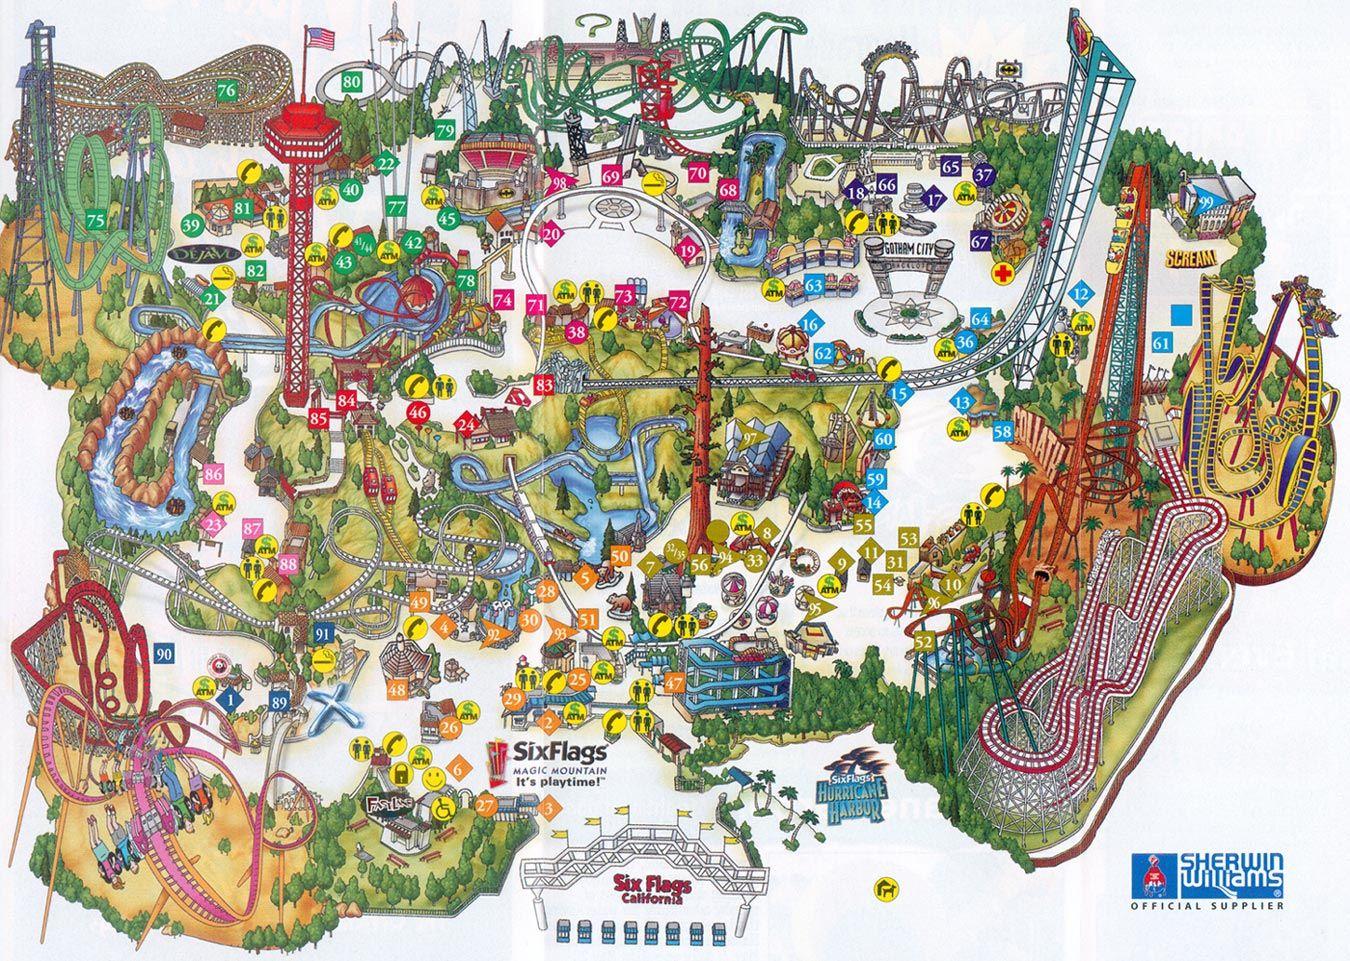 Six Flags Magic Mountain Map. | Assorted Ii In 2019 | Pinterest - Six Flags Map California 2018